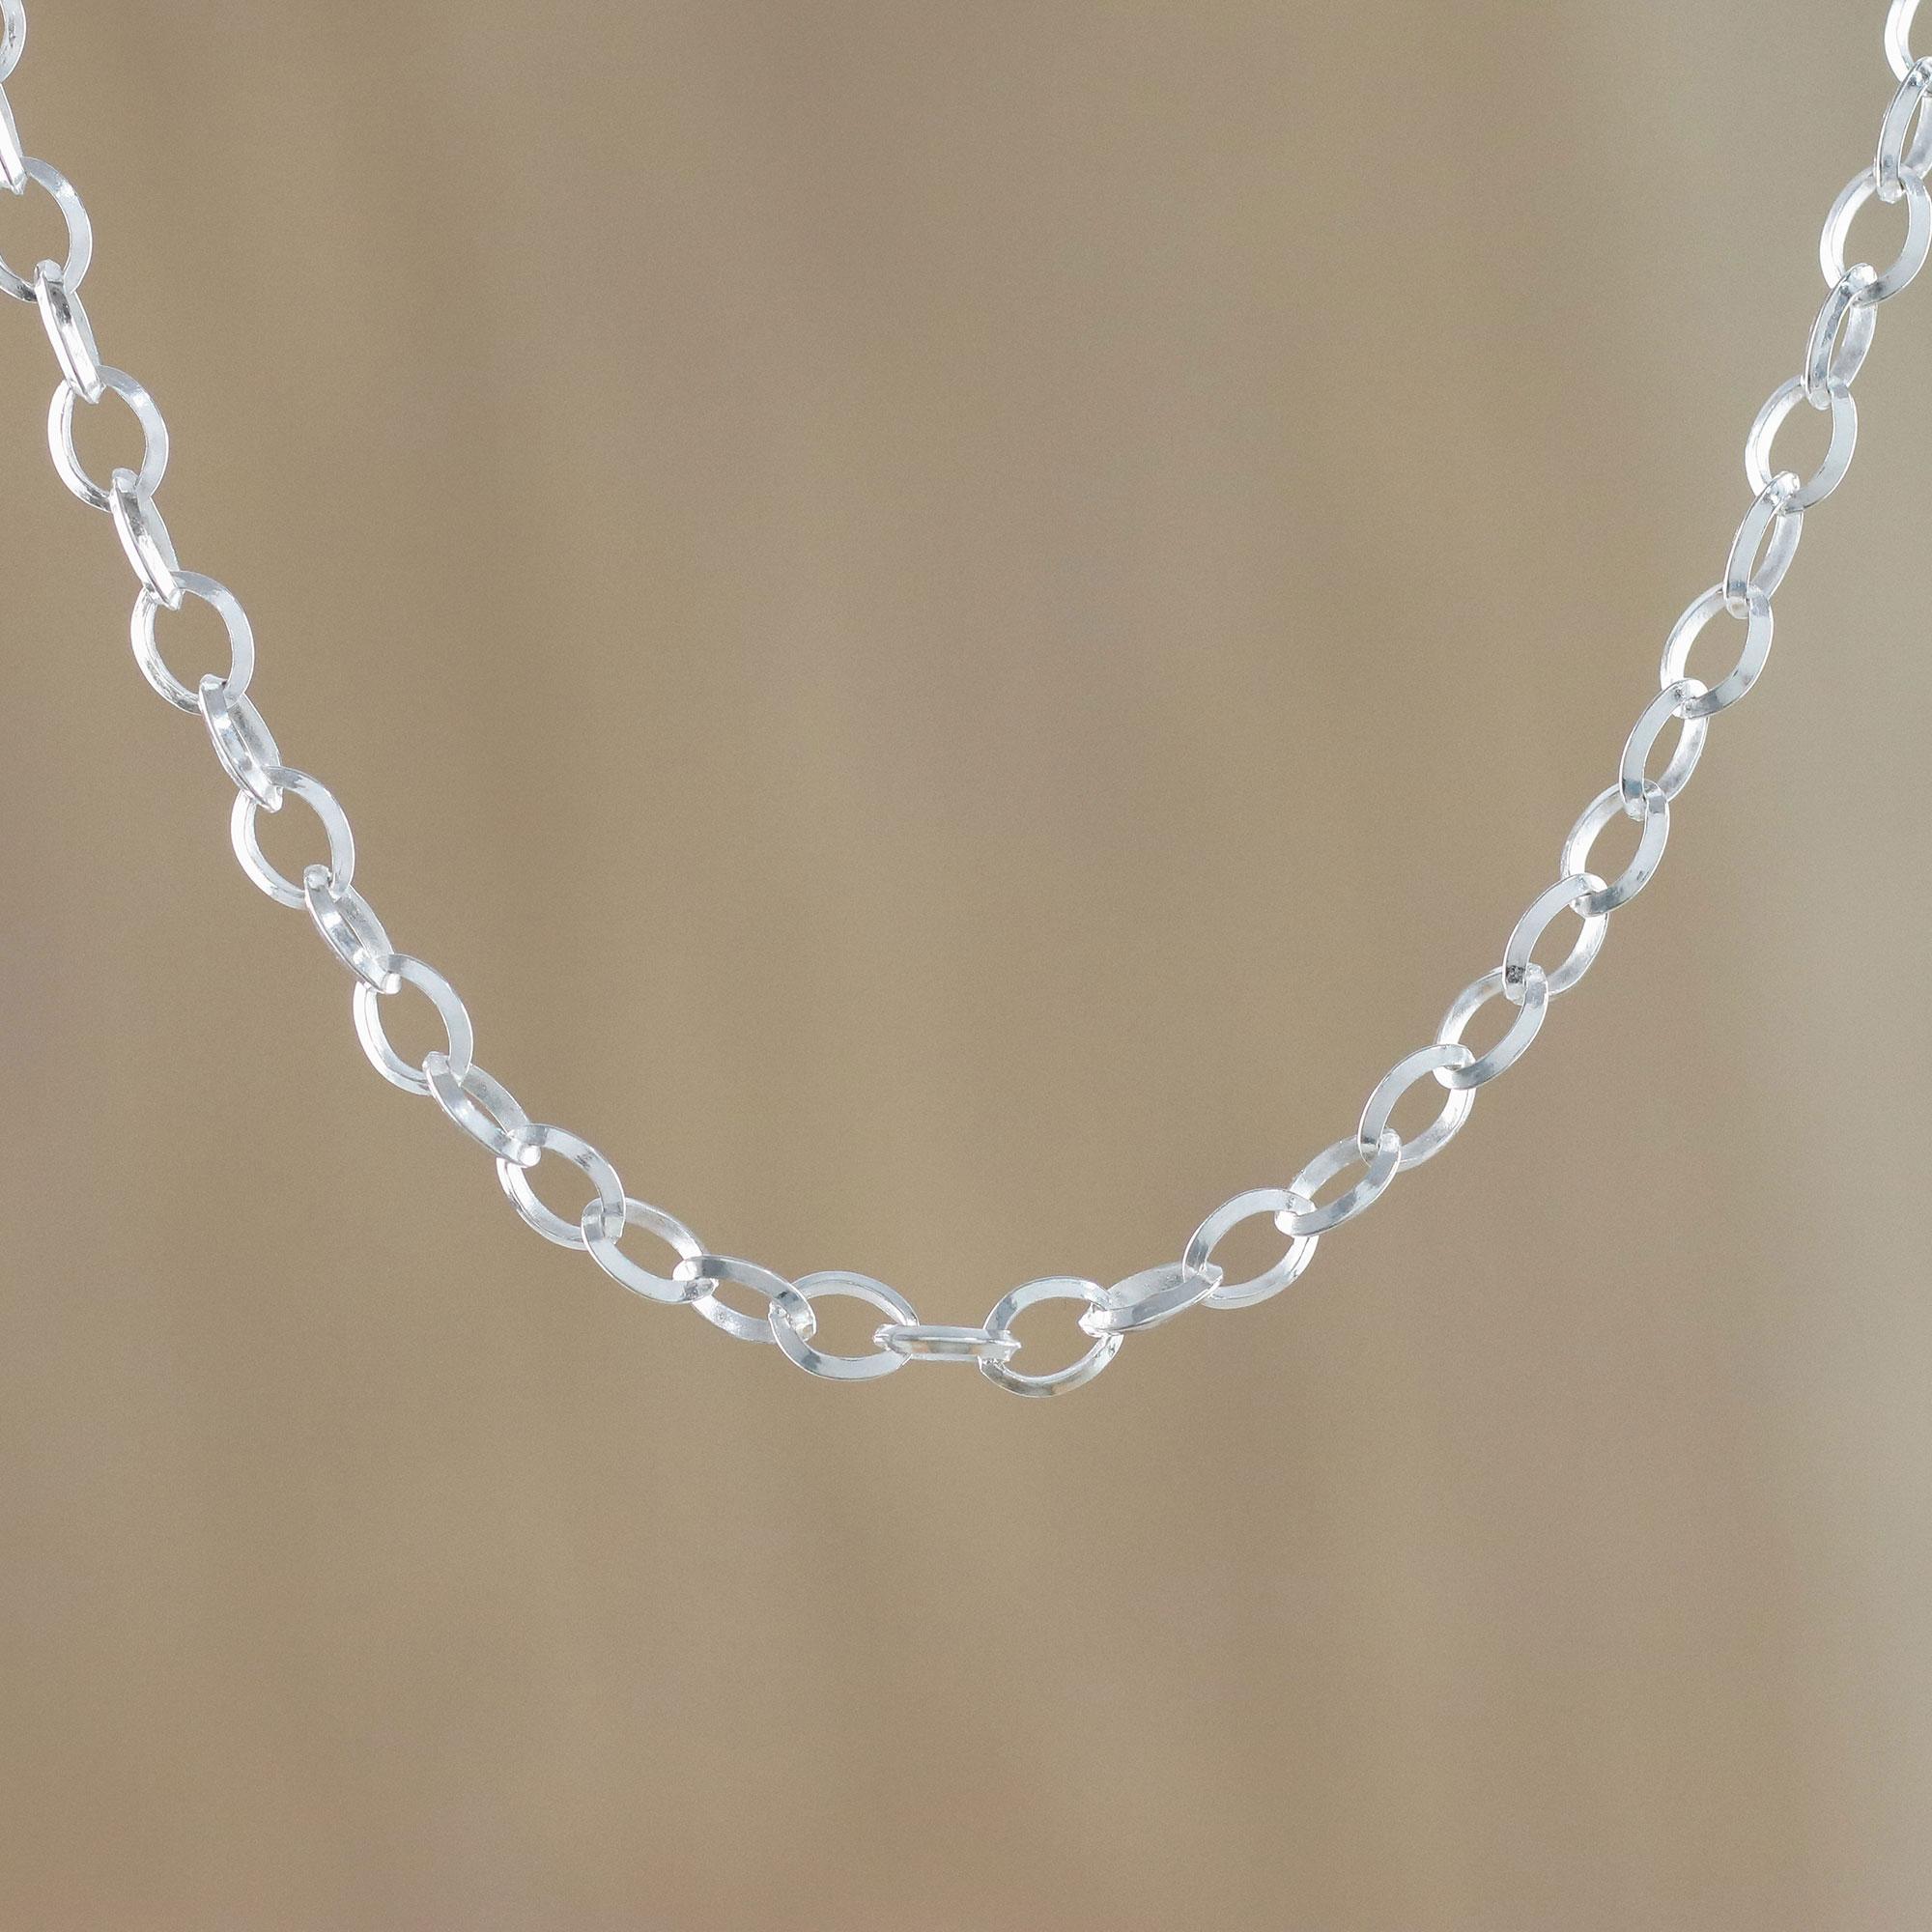 Fashionable Trendy Gold Circle Link Design Bohemian Stylish Choker Necklace